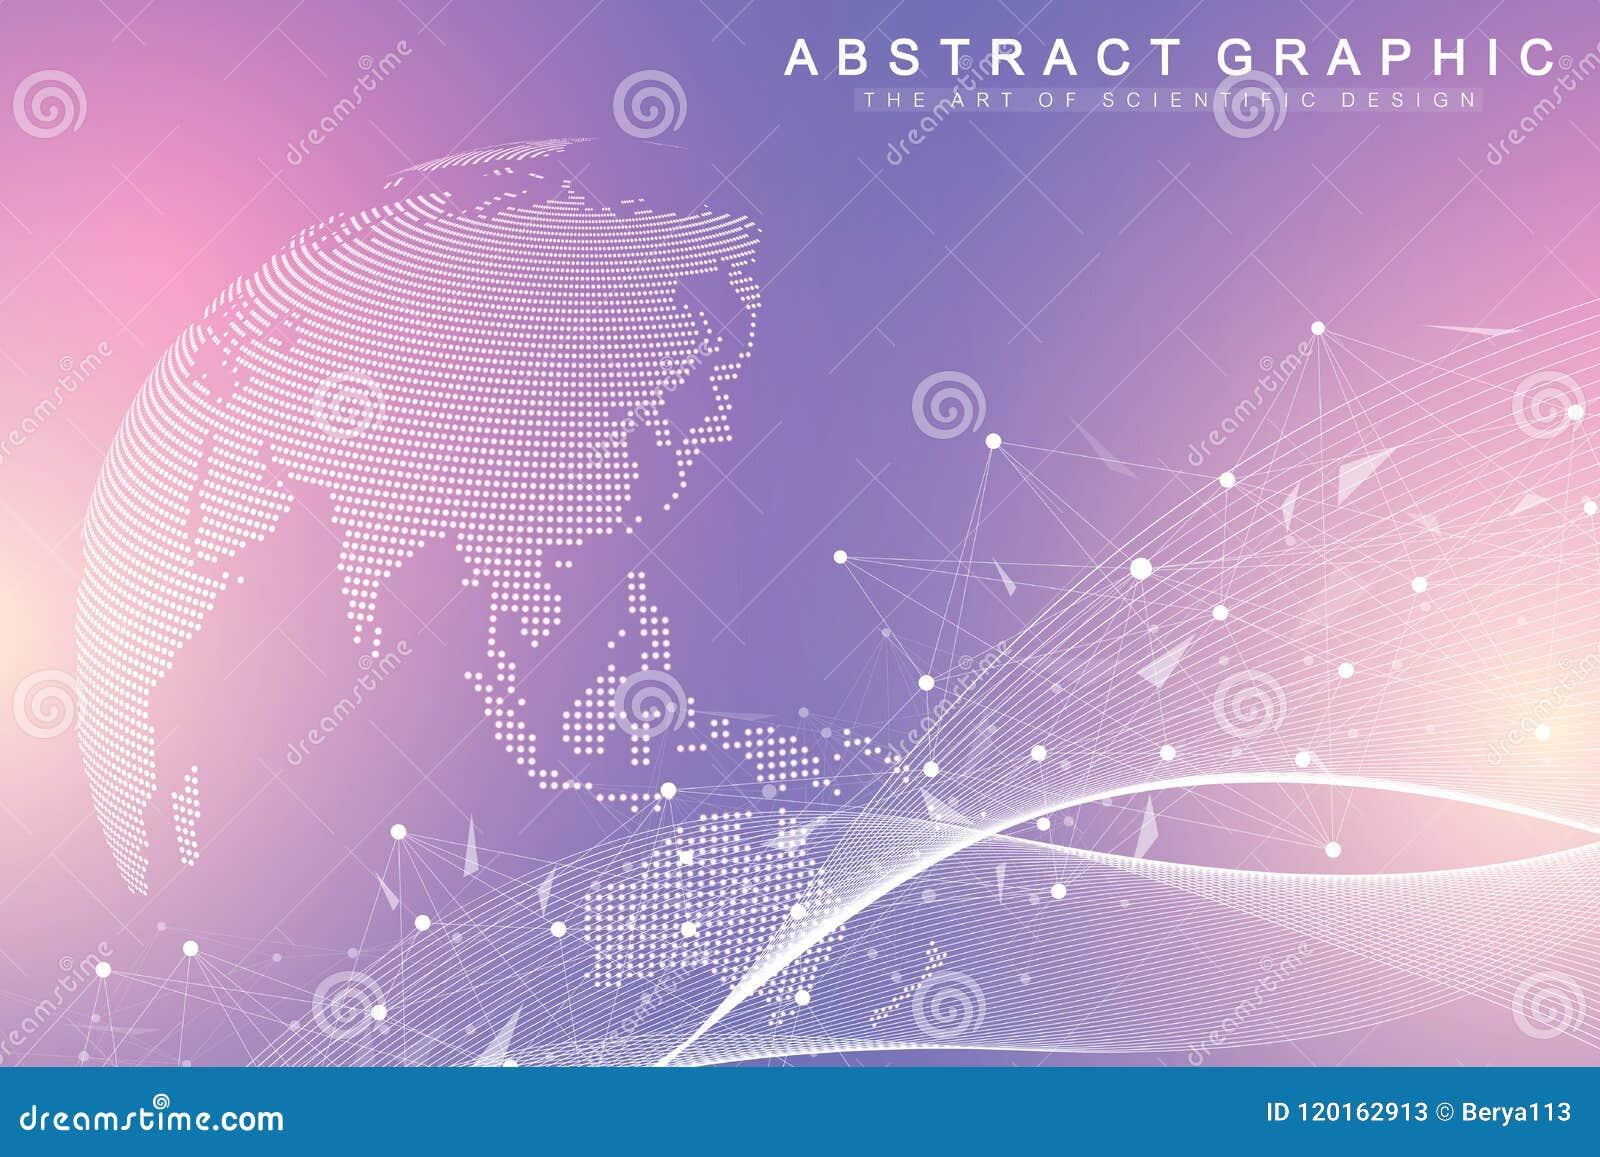 Grote gegevensvisualisatie Grafische abstracte mededeling als achtergrond Perspectiefachtergrond Minimale serie Digitale gegevens